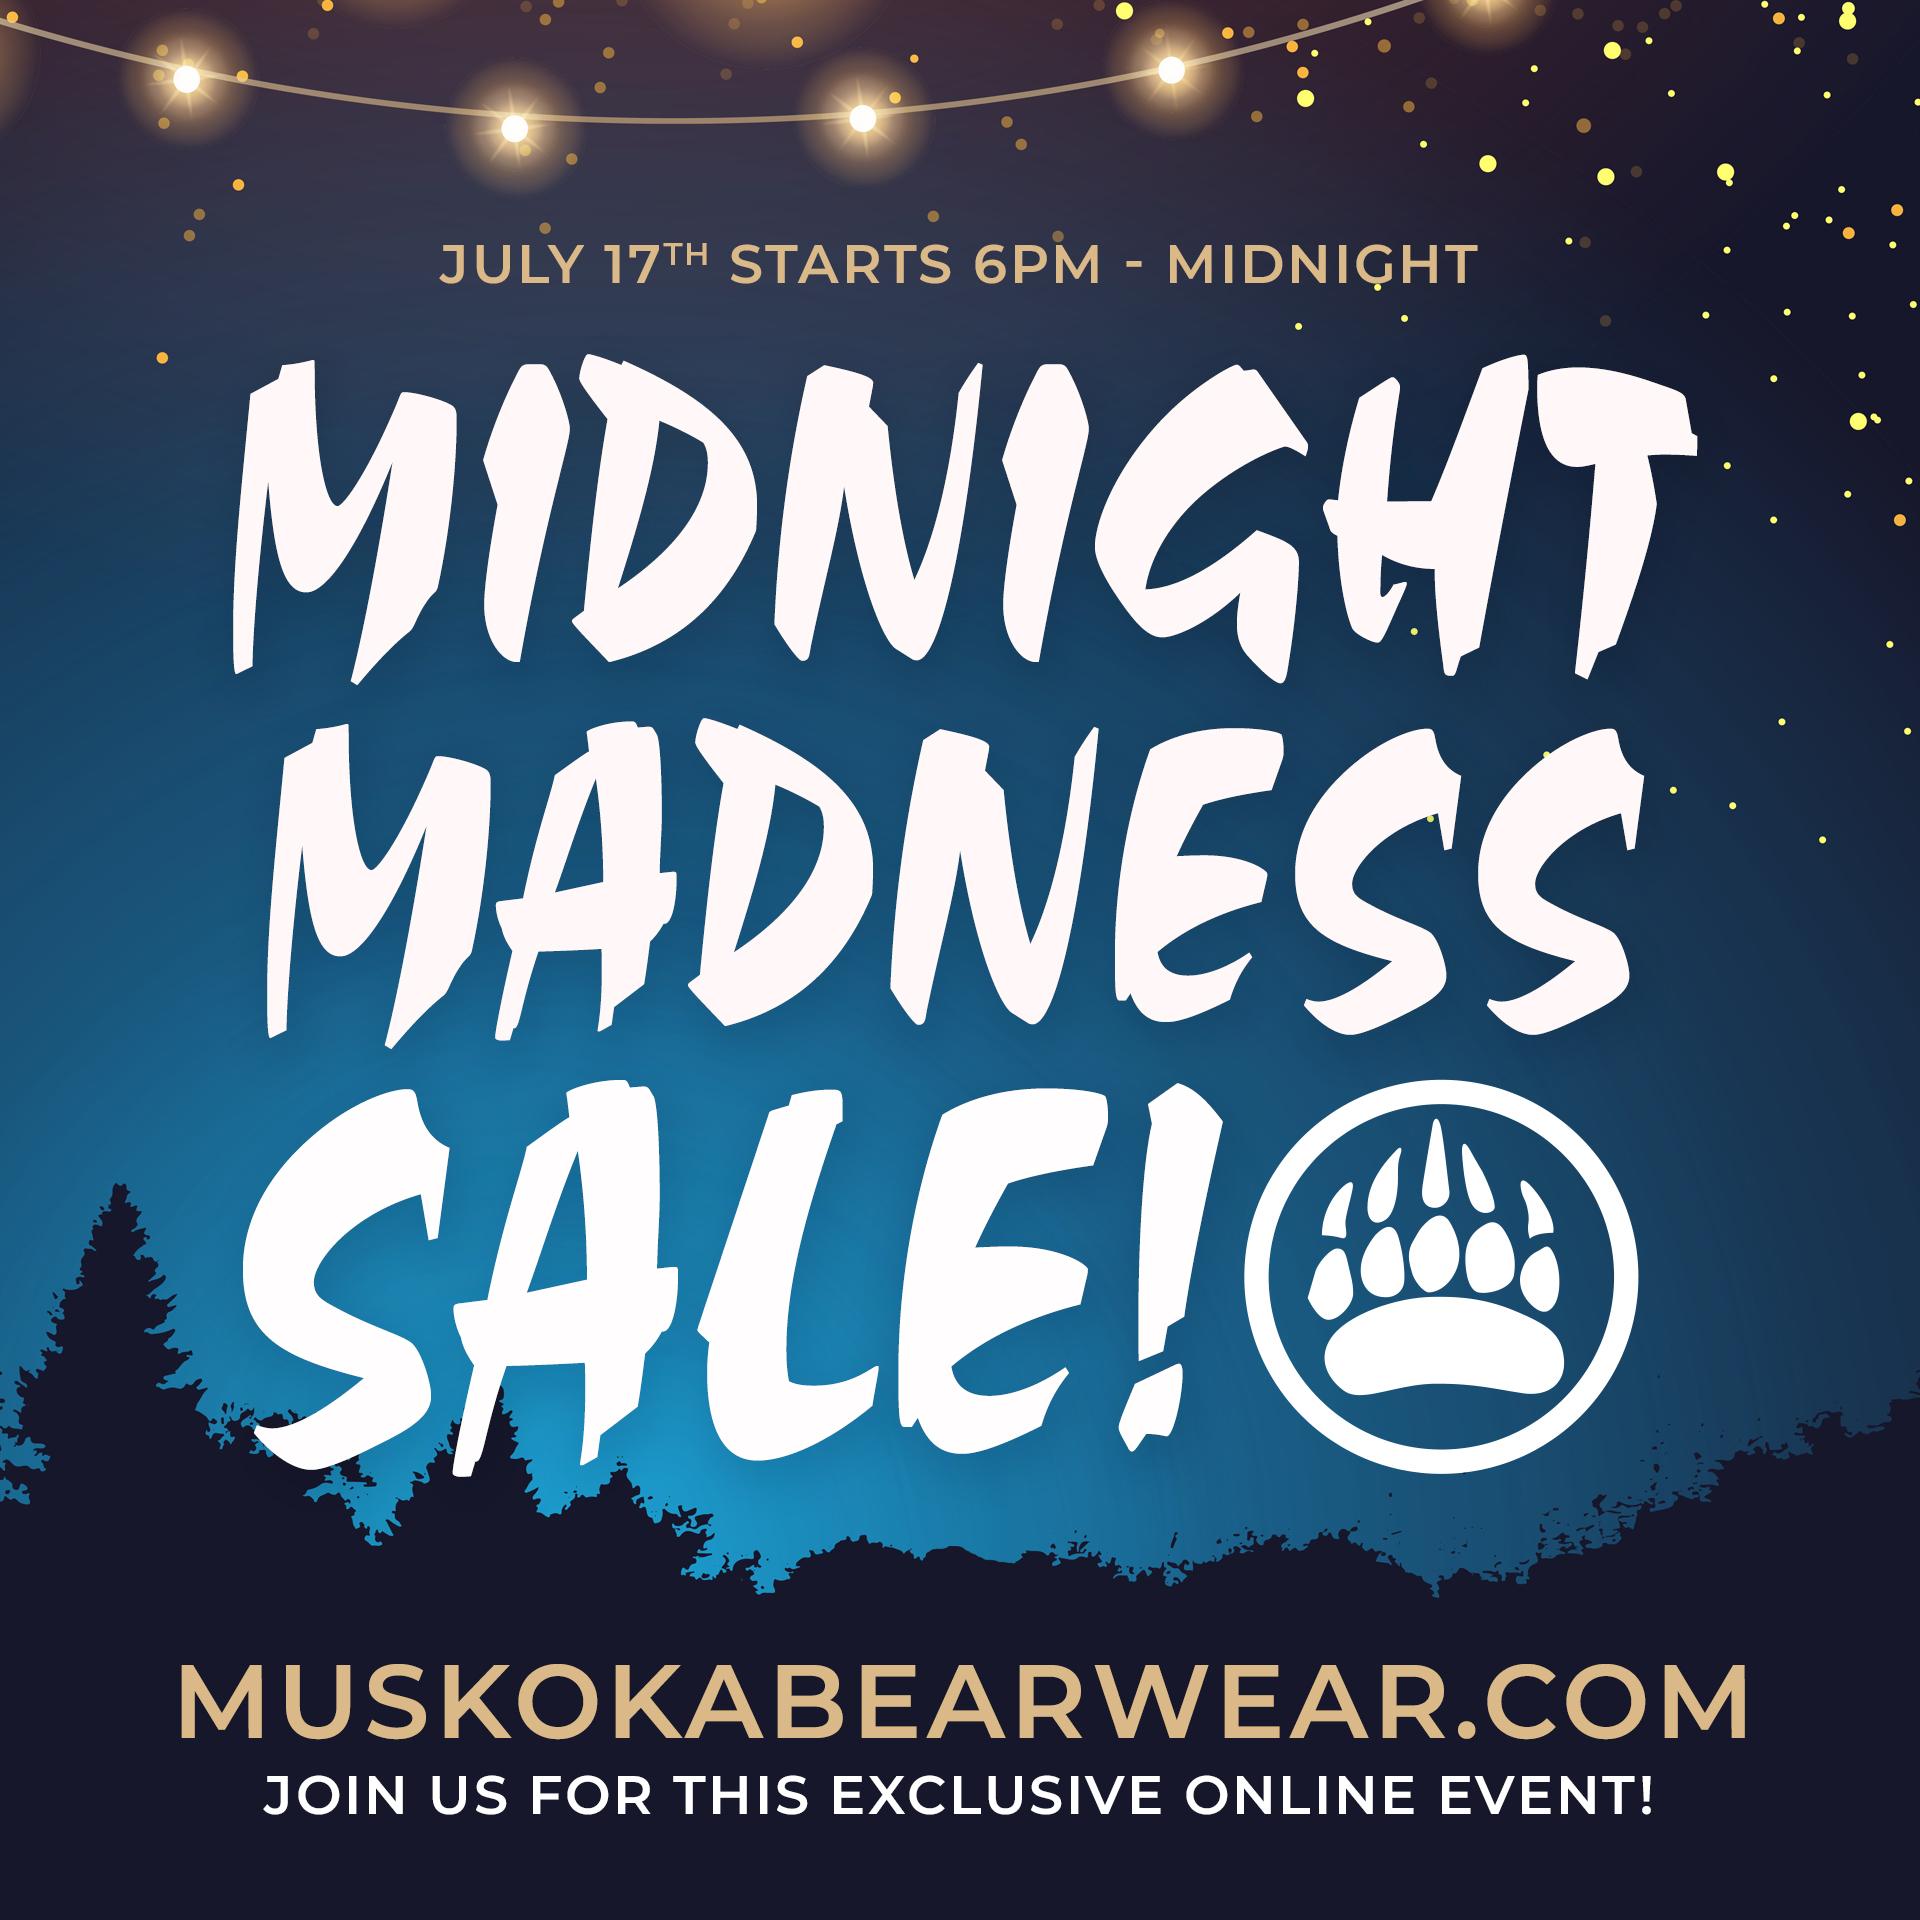 Virtual Midnight Madness!